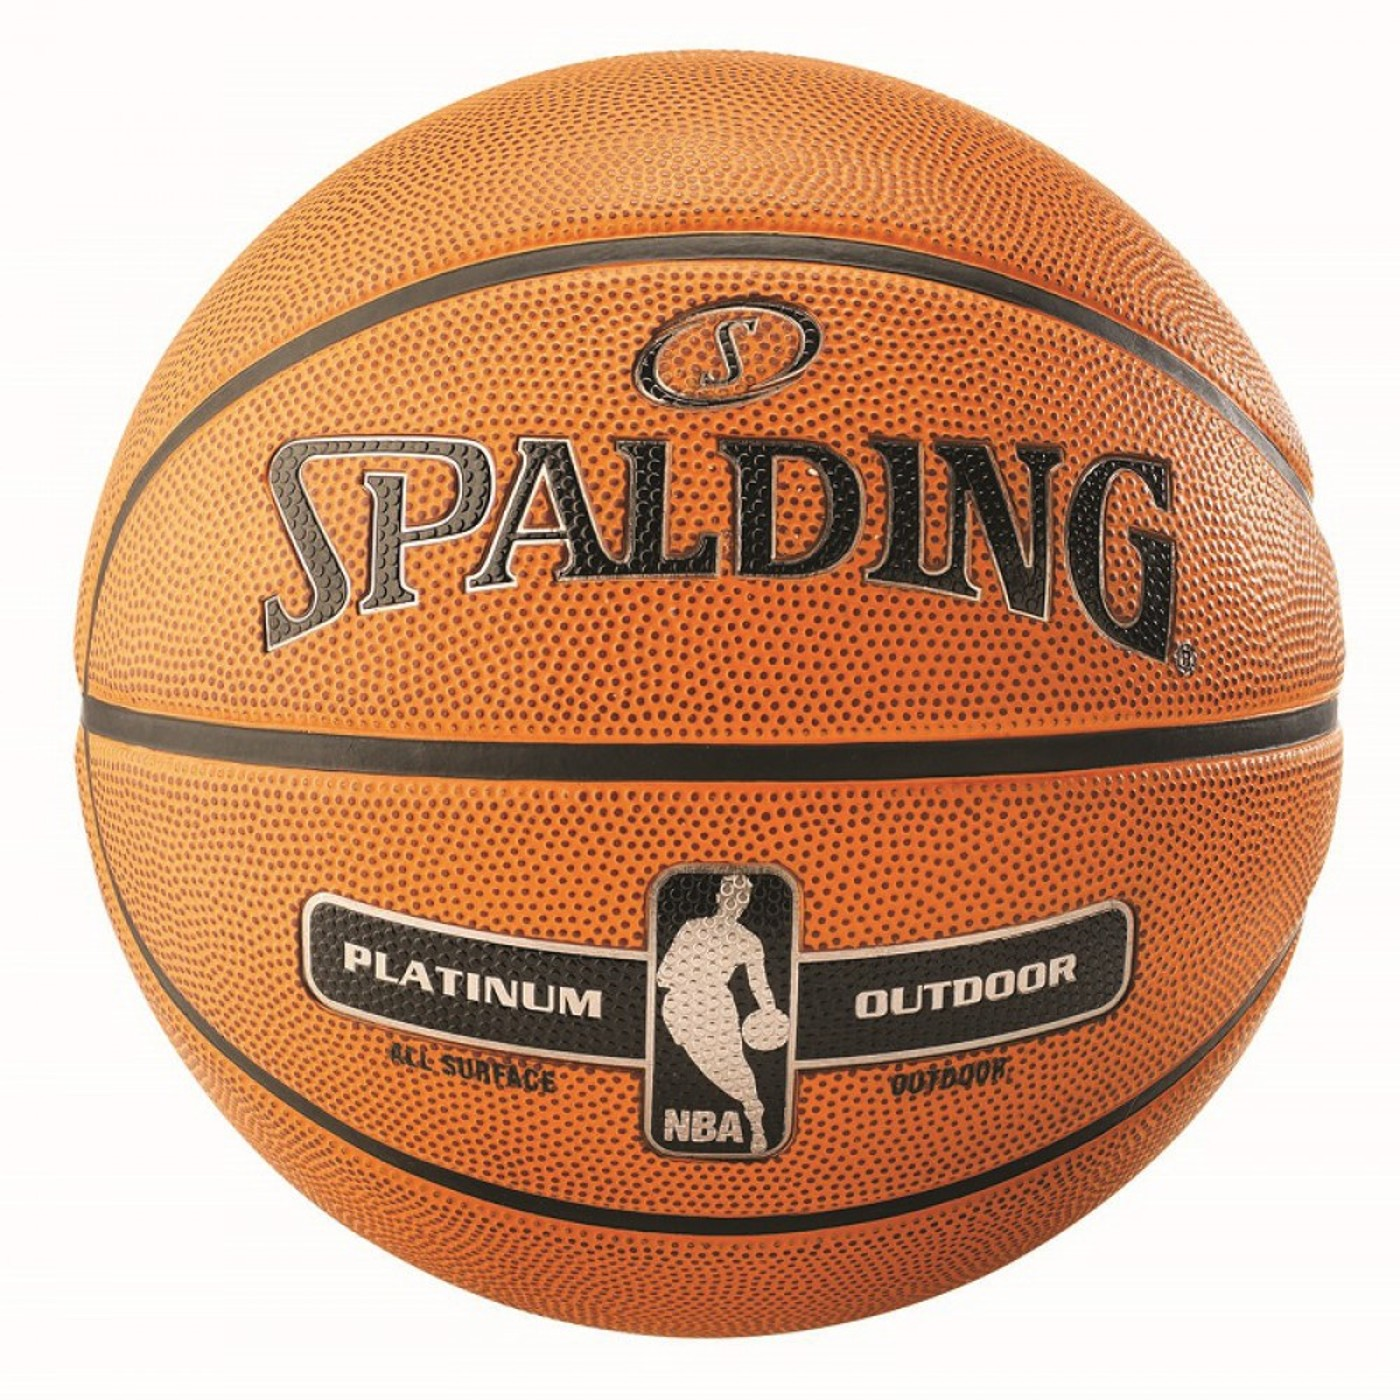 SPALDING NBA PLATINUM OUTDOOR SZ. 7